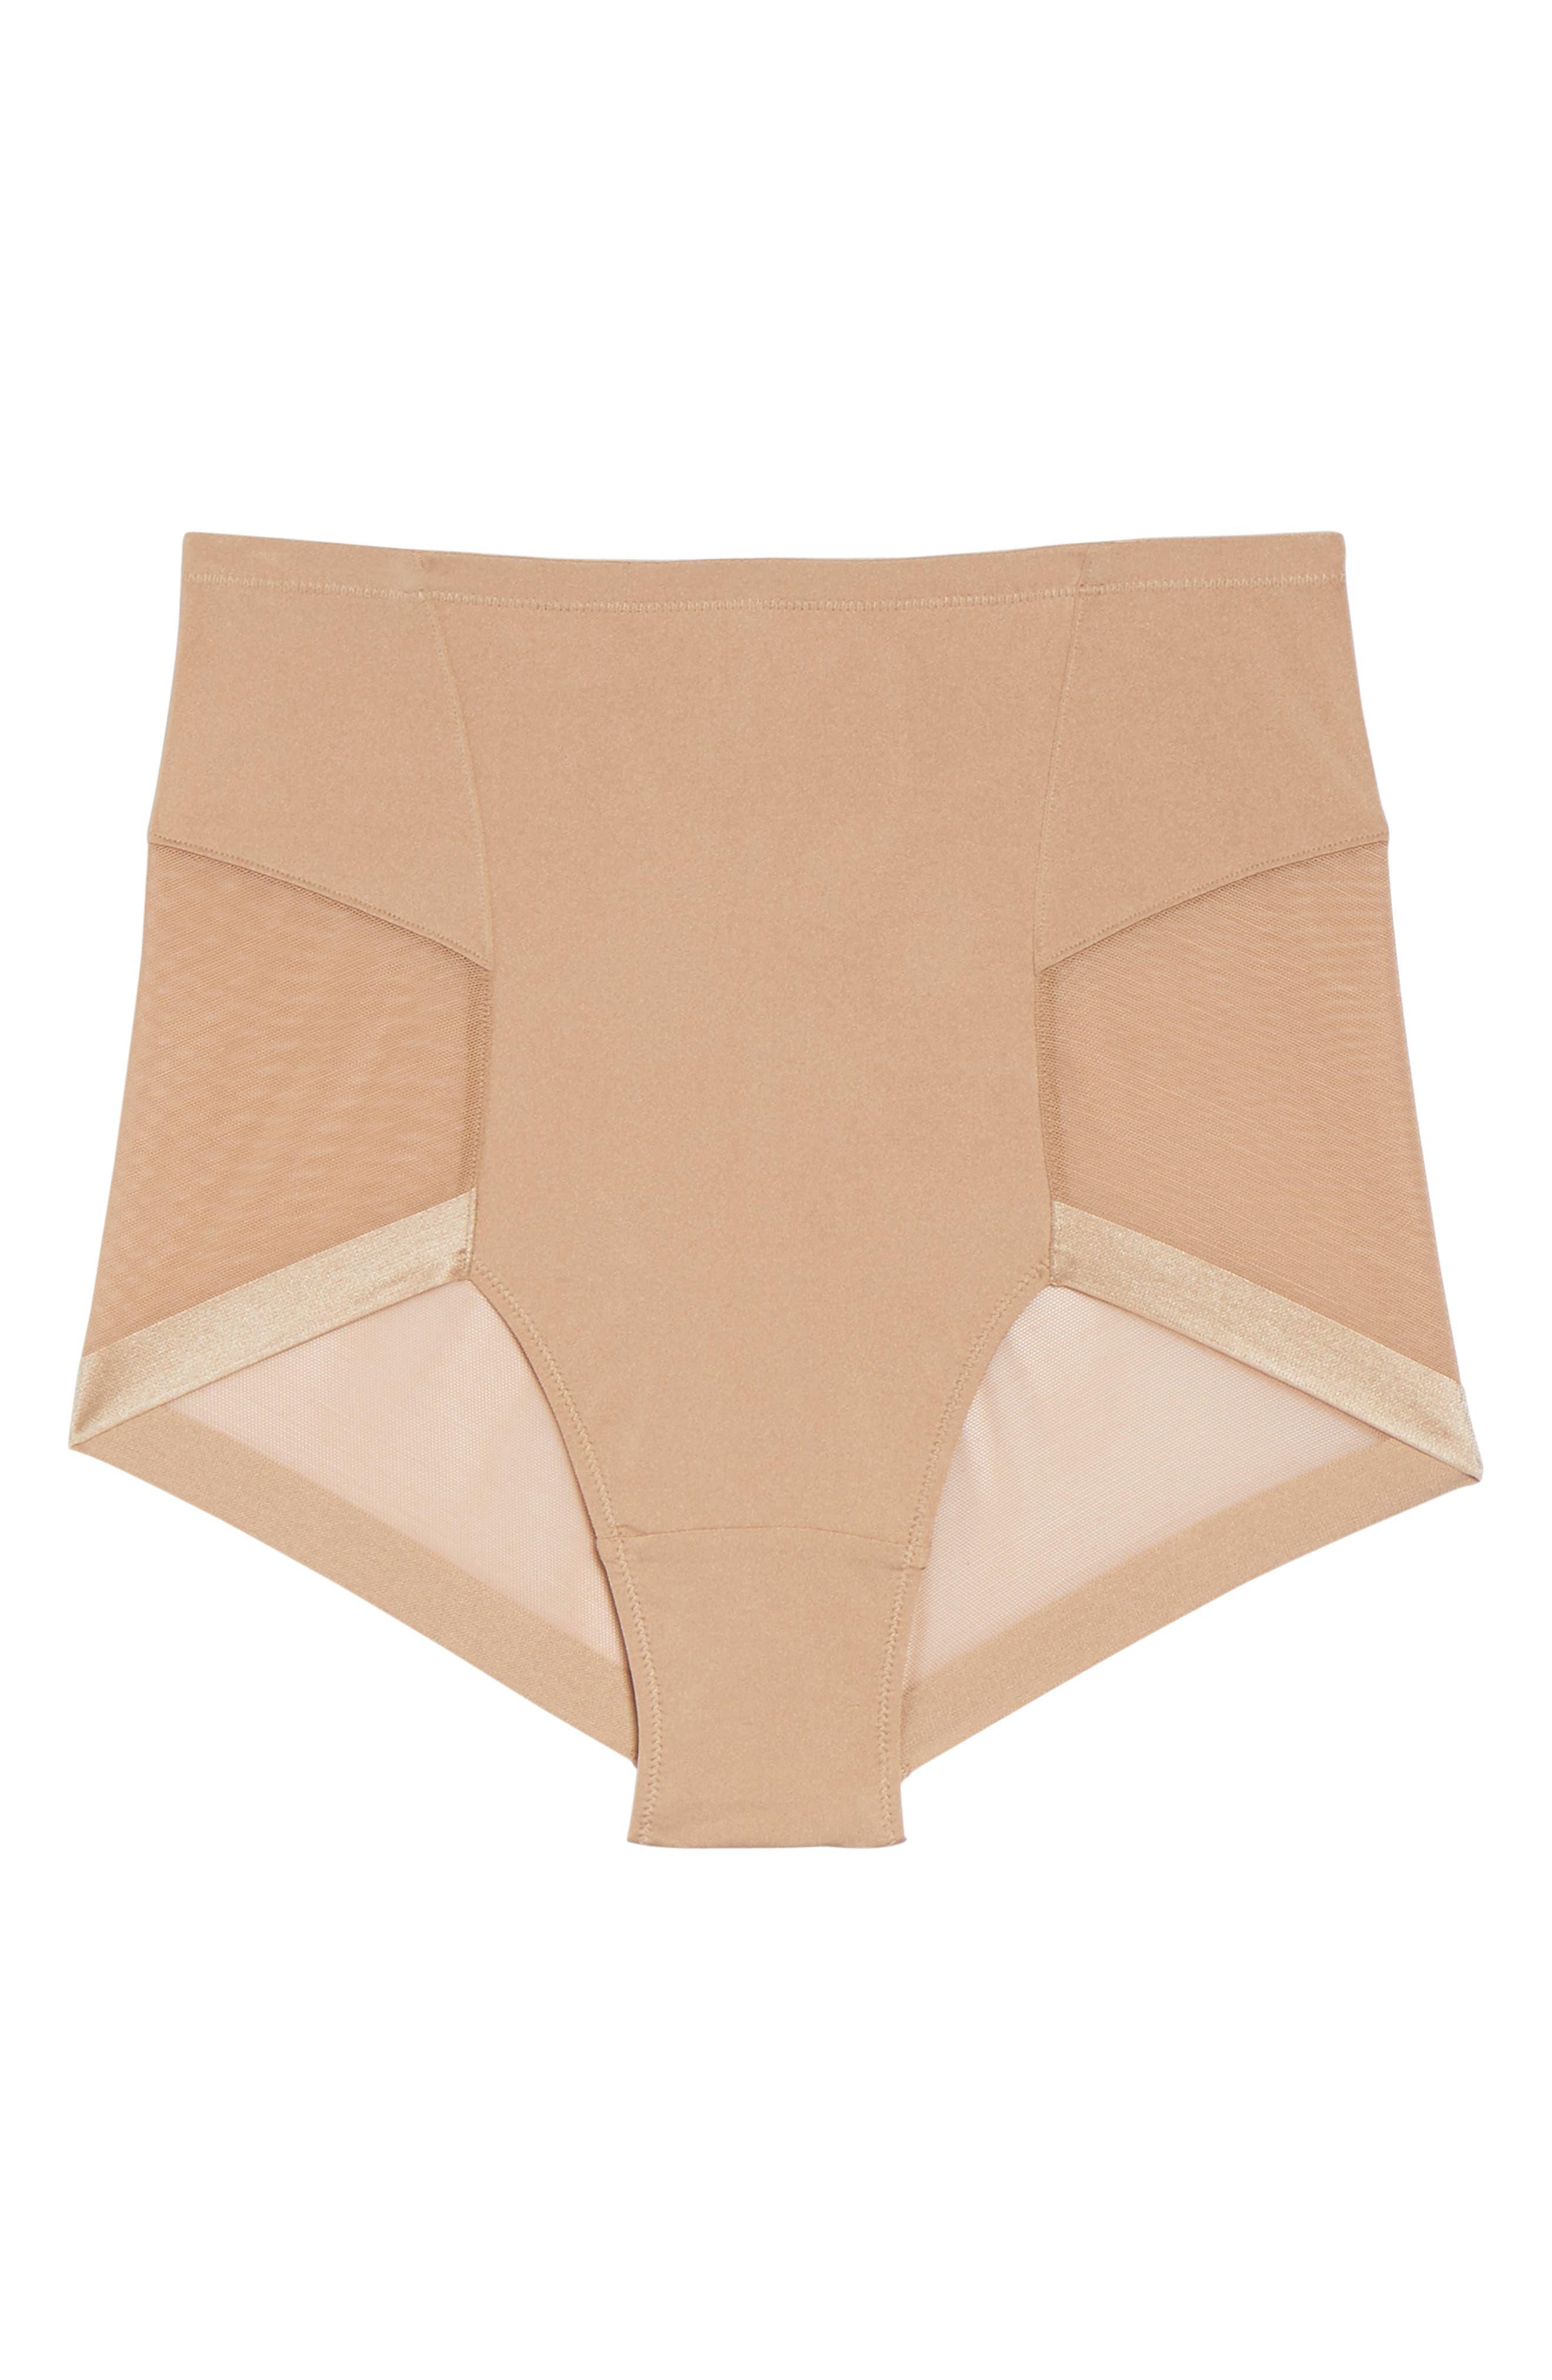 Alternate Image 4  - Le Mystère Infinite High Waist Shaper Panties